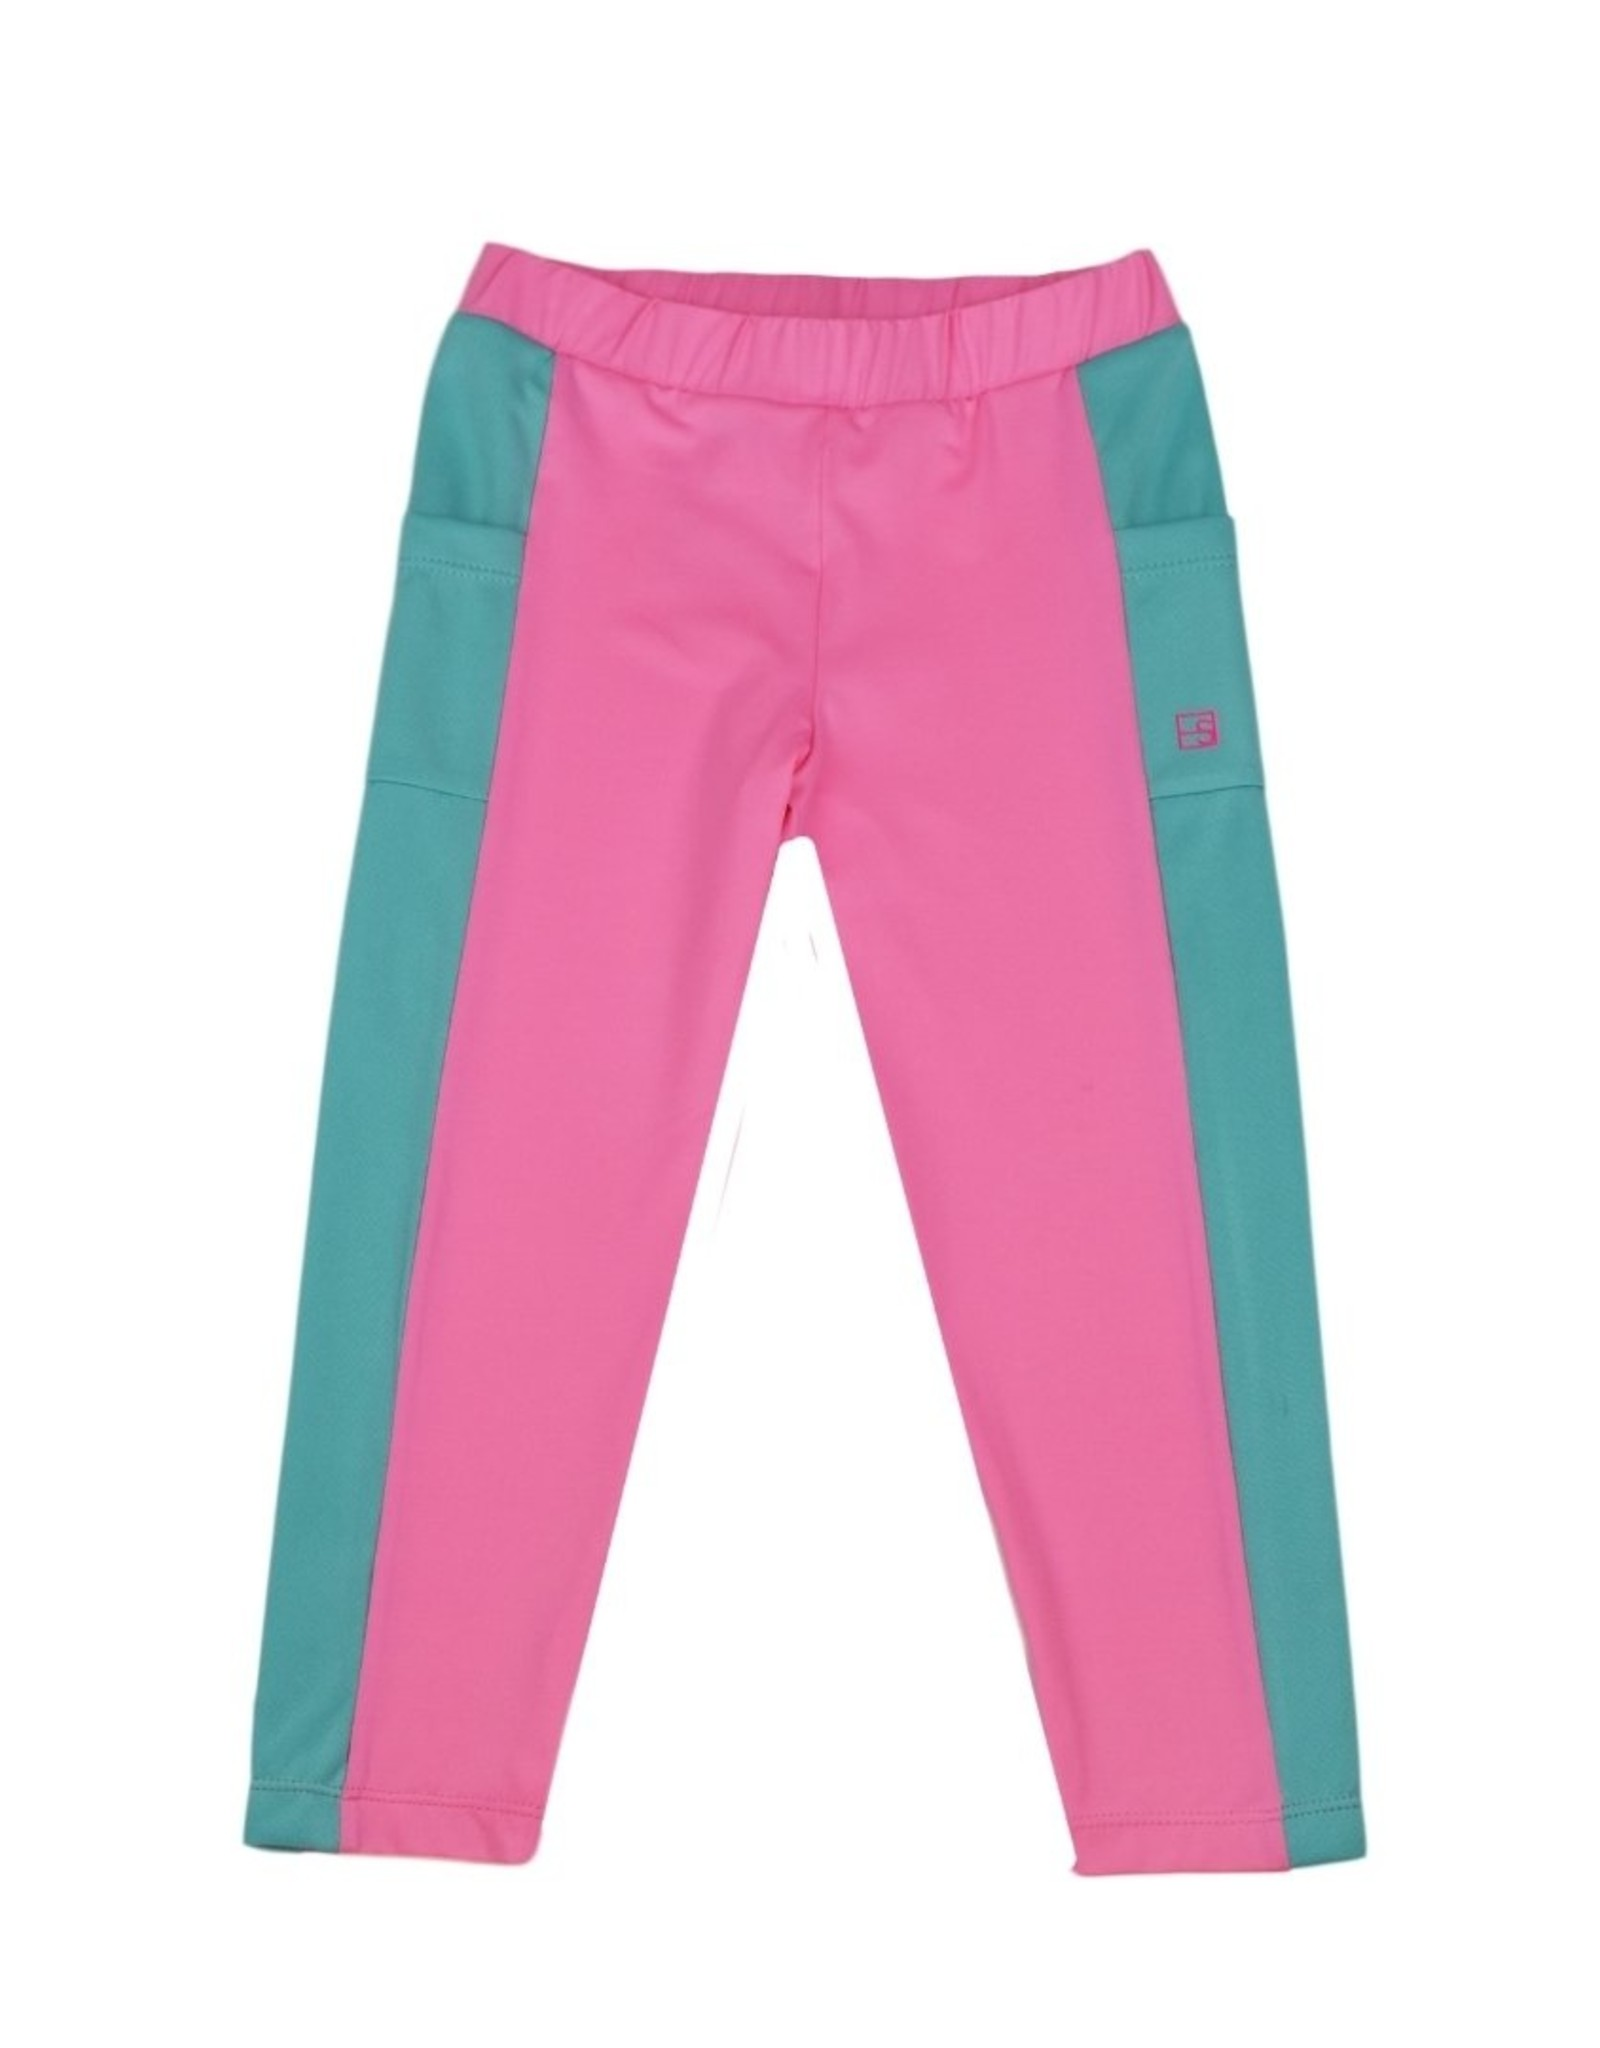 SET Lila Legging - Pink w/ Turquoise Sides